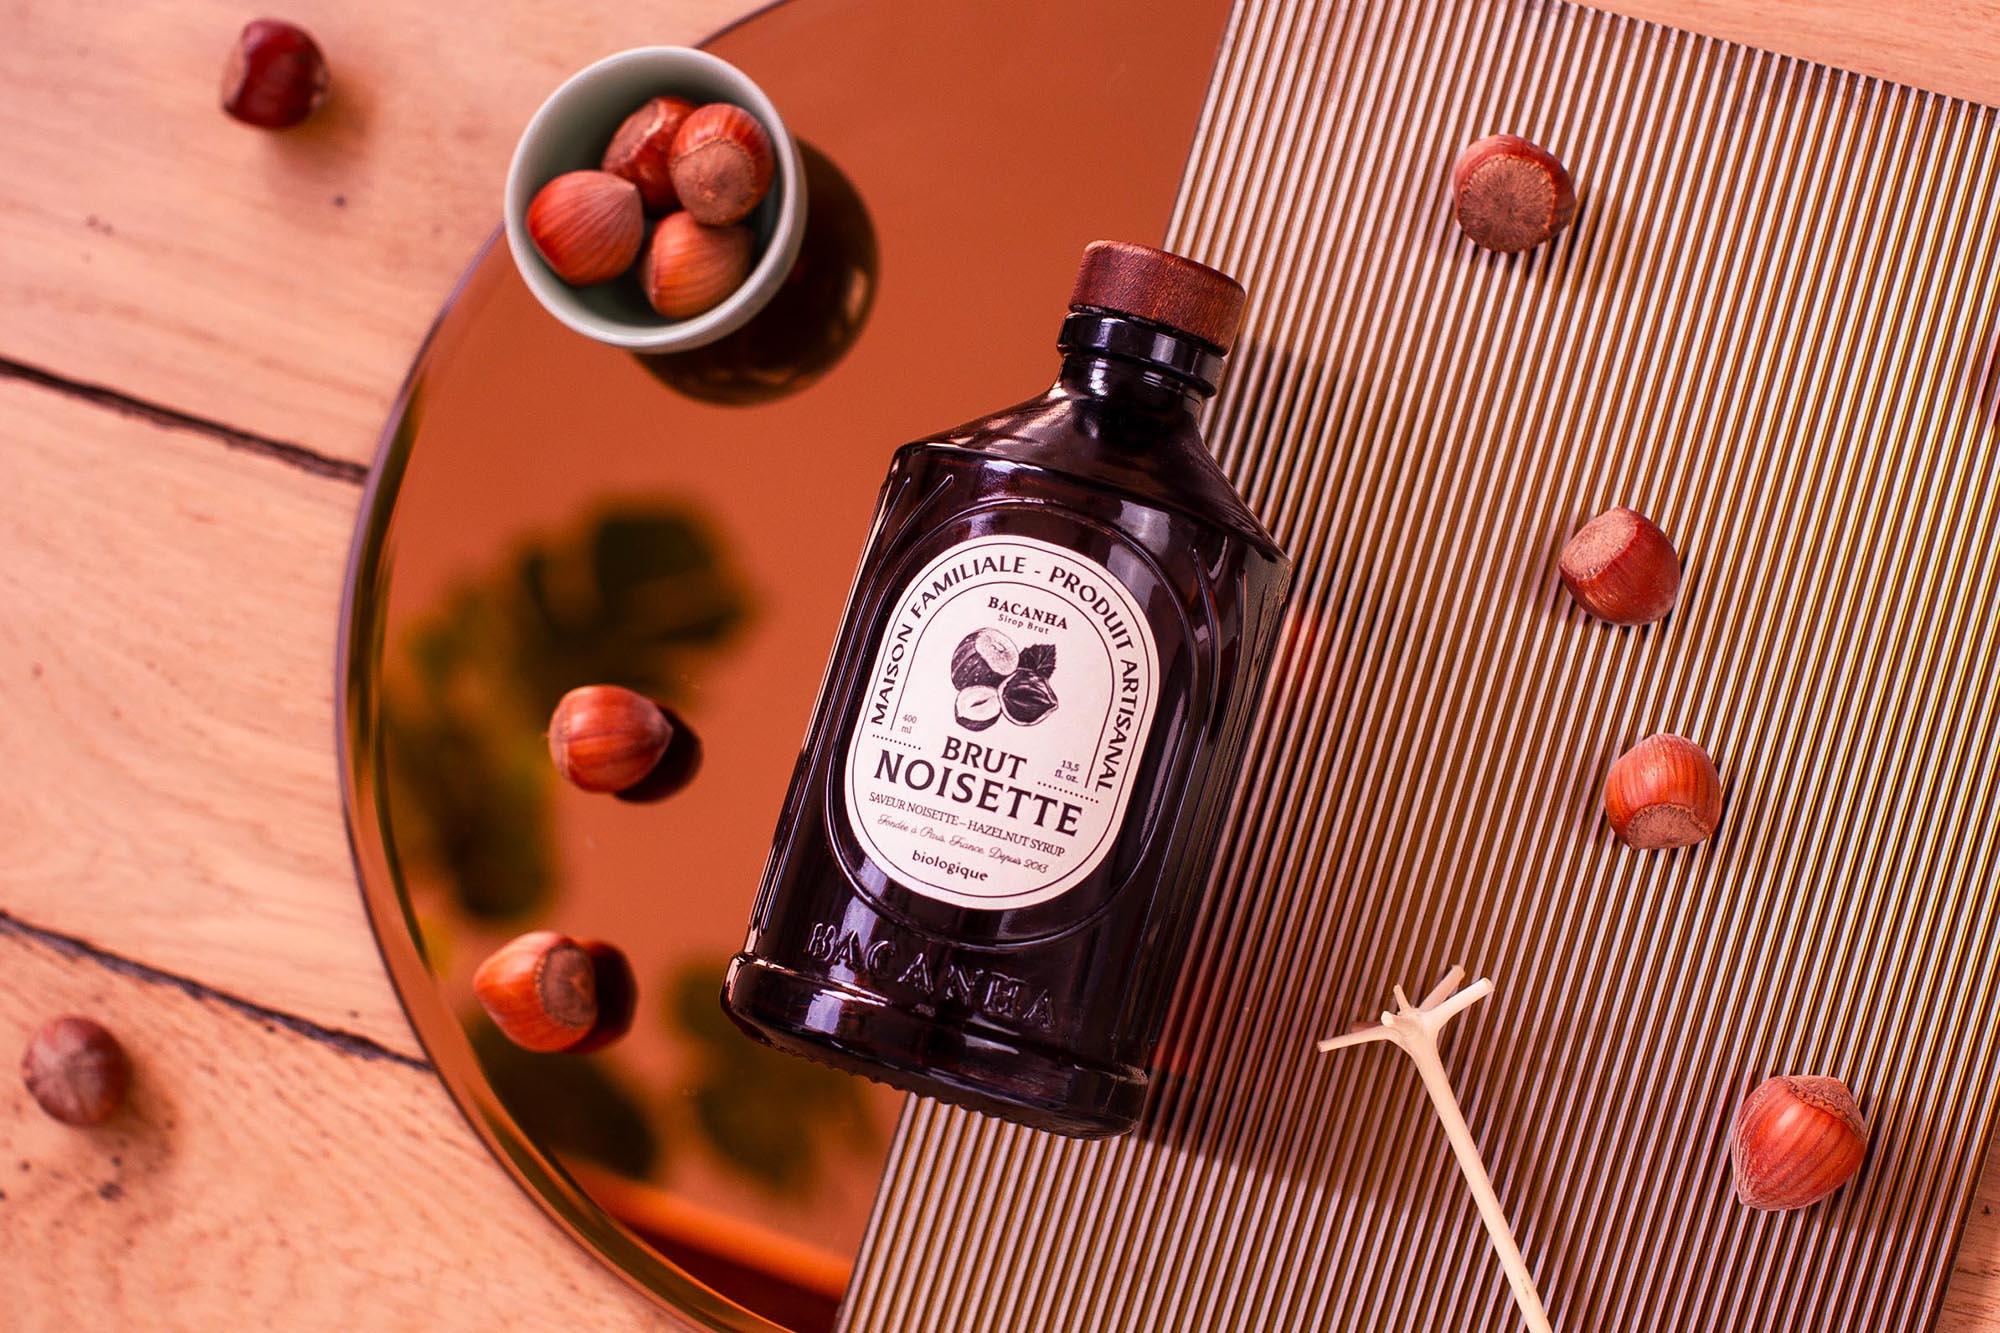 Studio Boam Creates The New Bacanha's Bottle Design